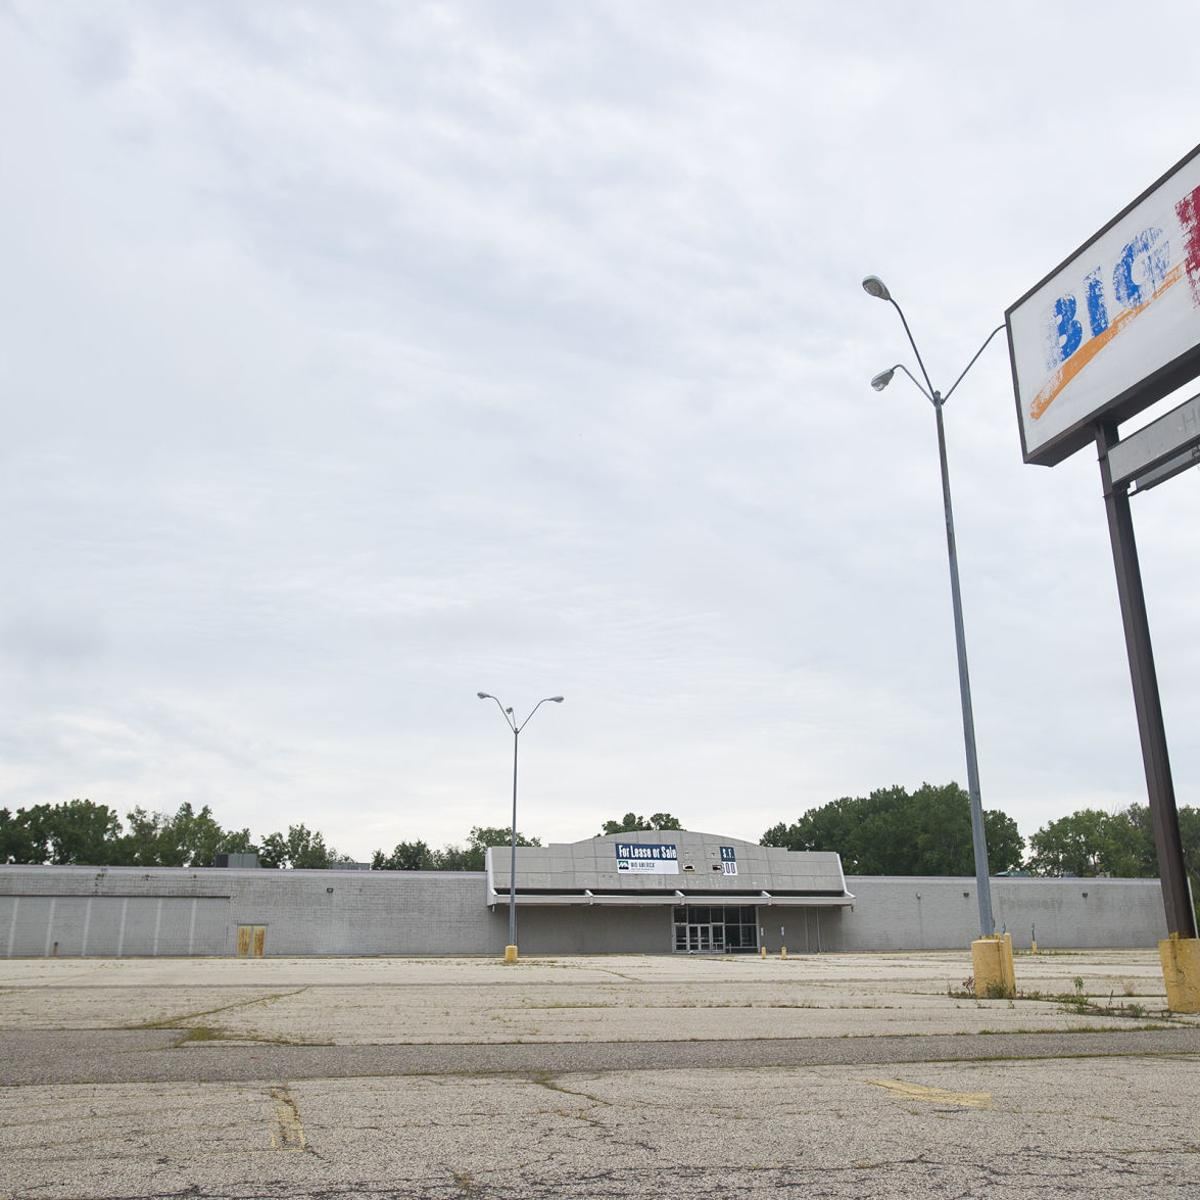 Health care provider purchases old Kmart building in Winona